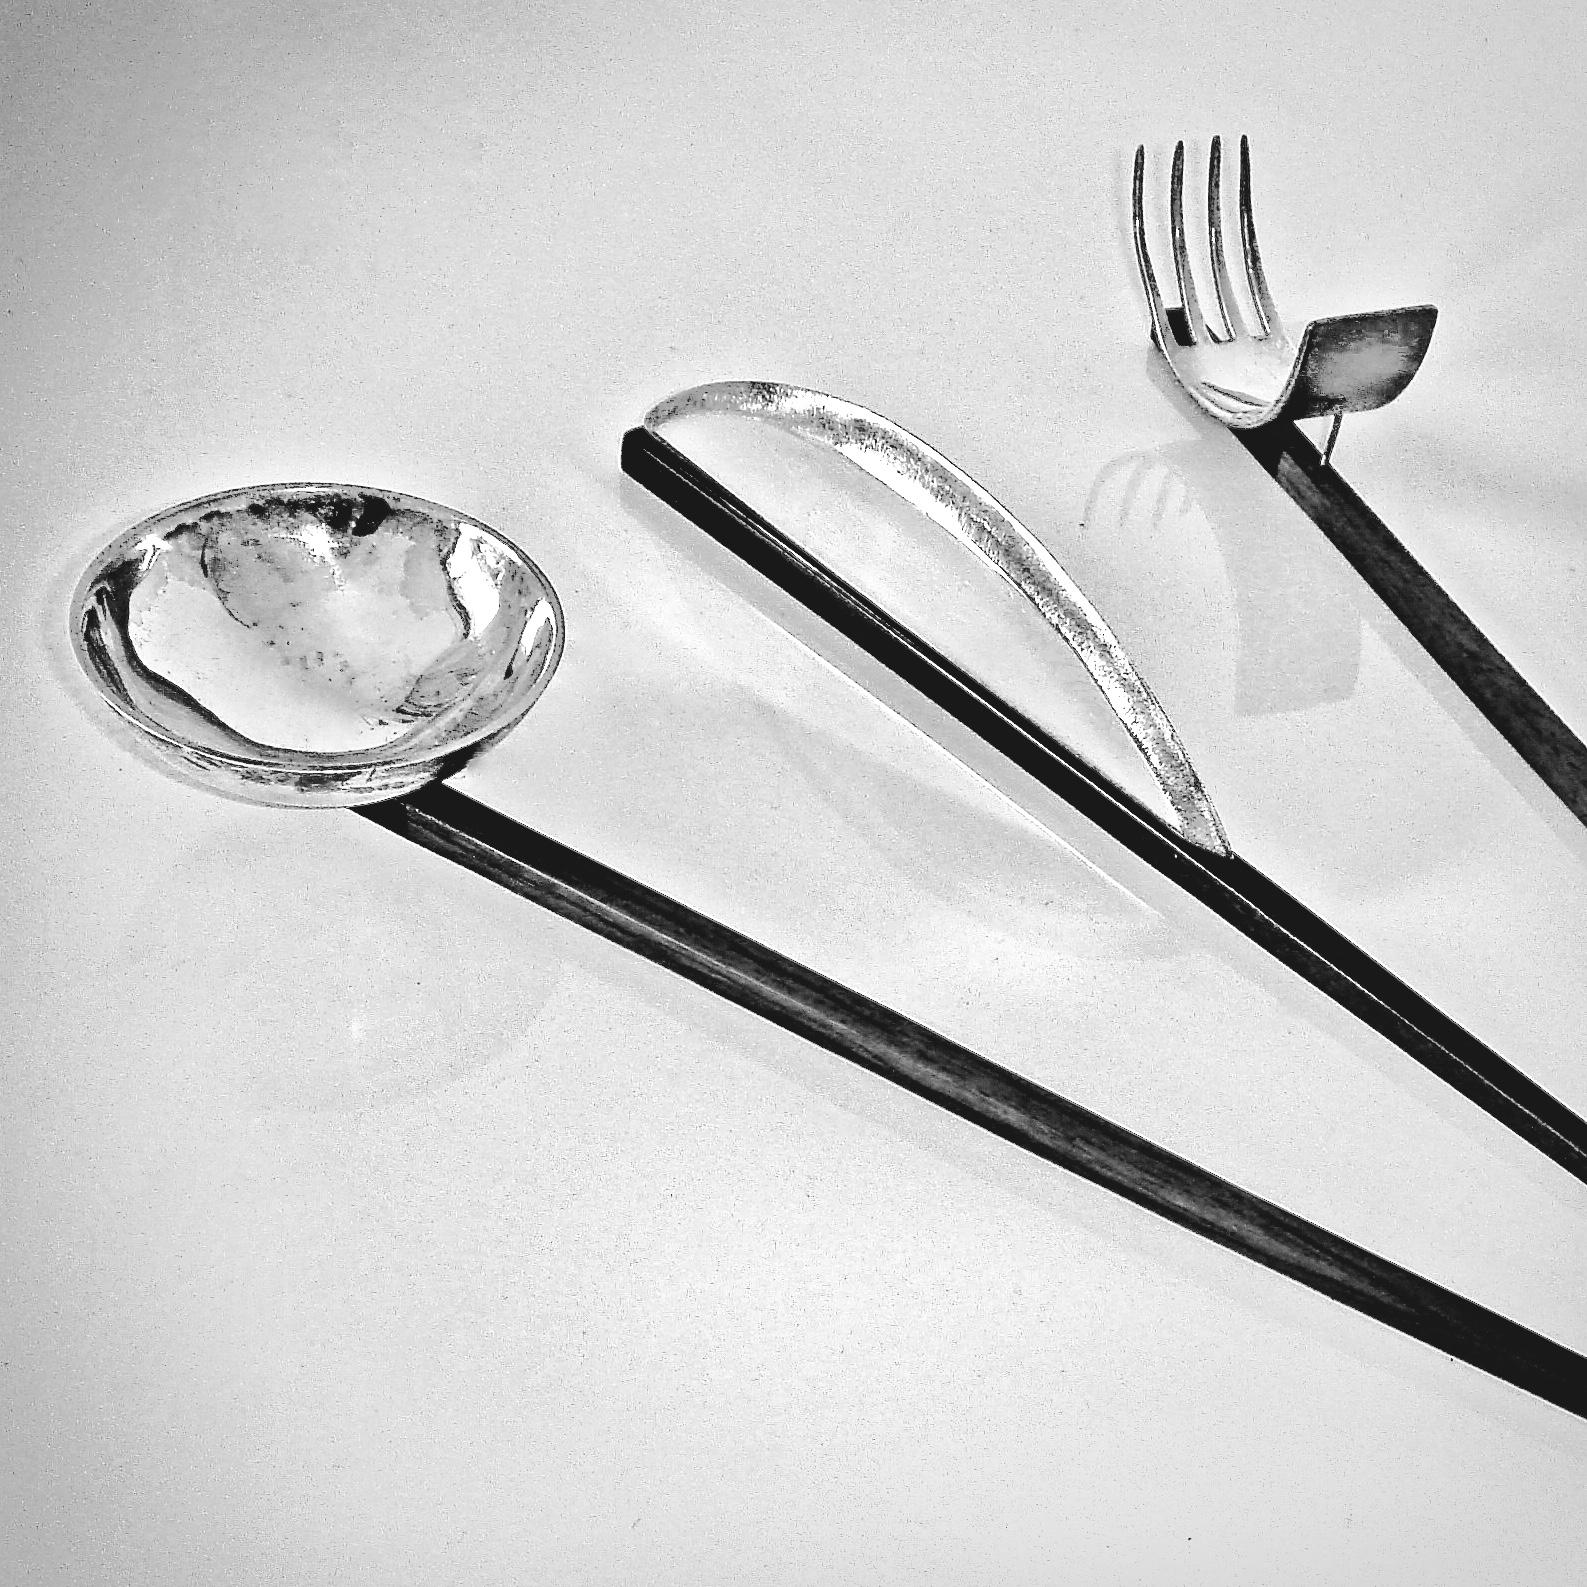 JAPAN (knife, fork, spoon)